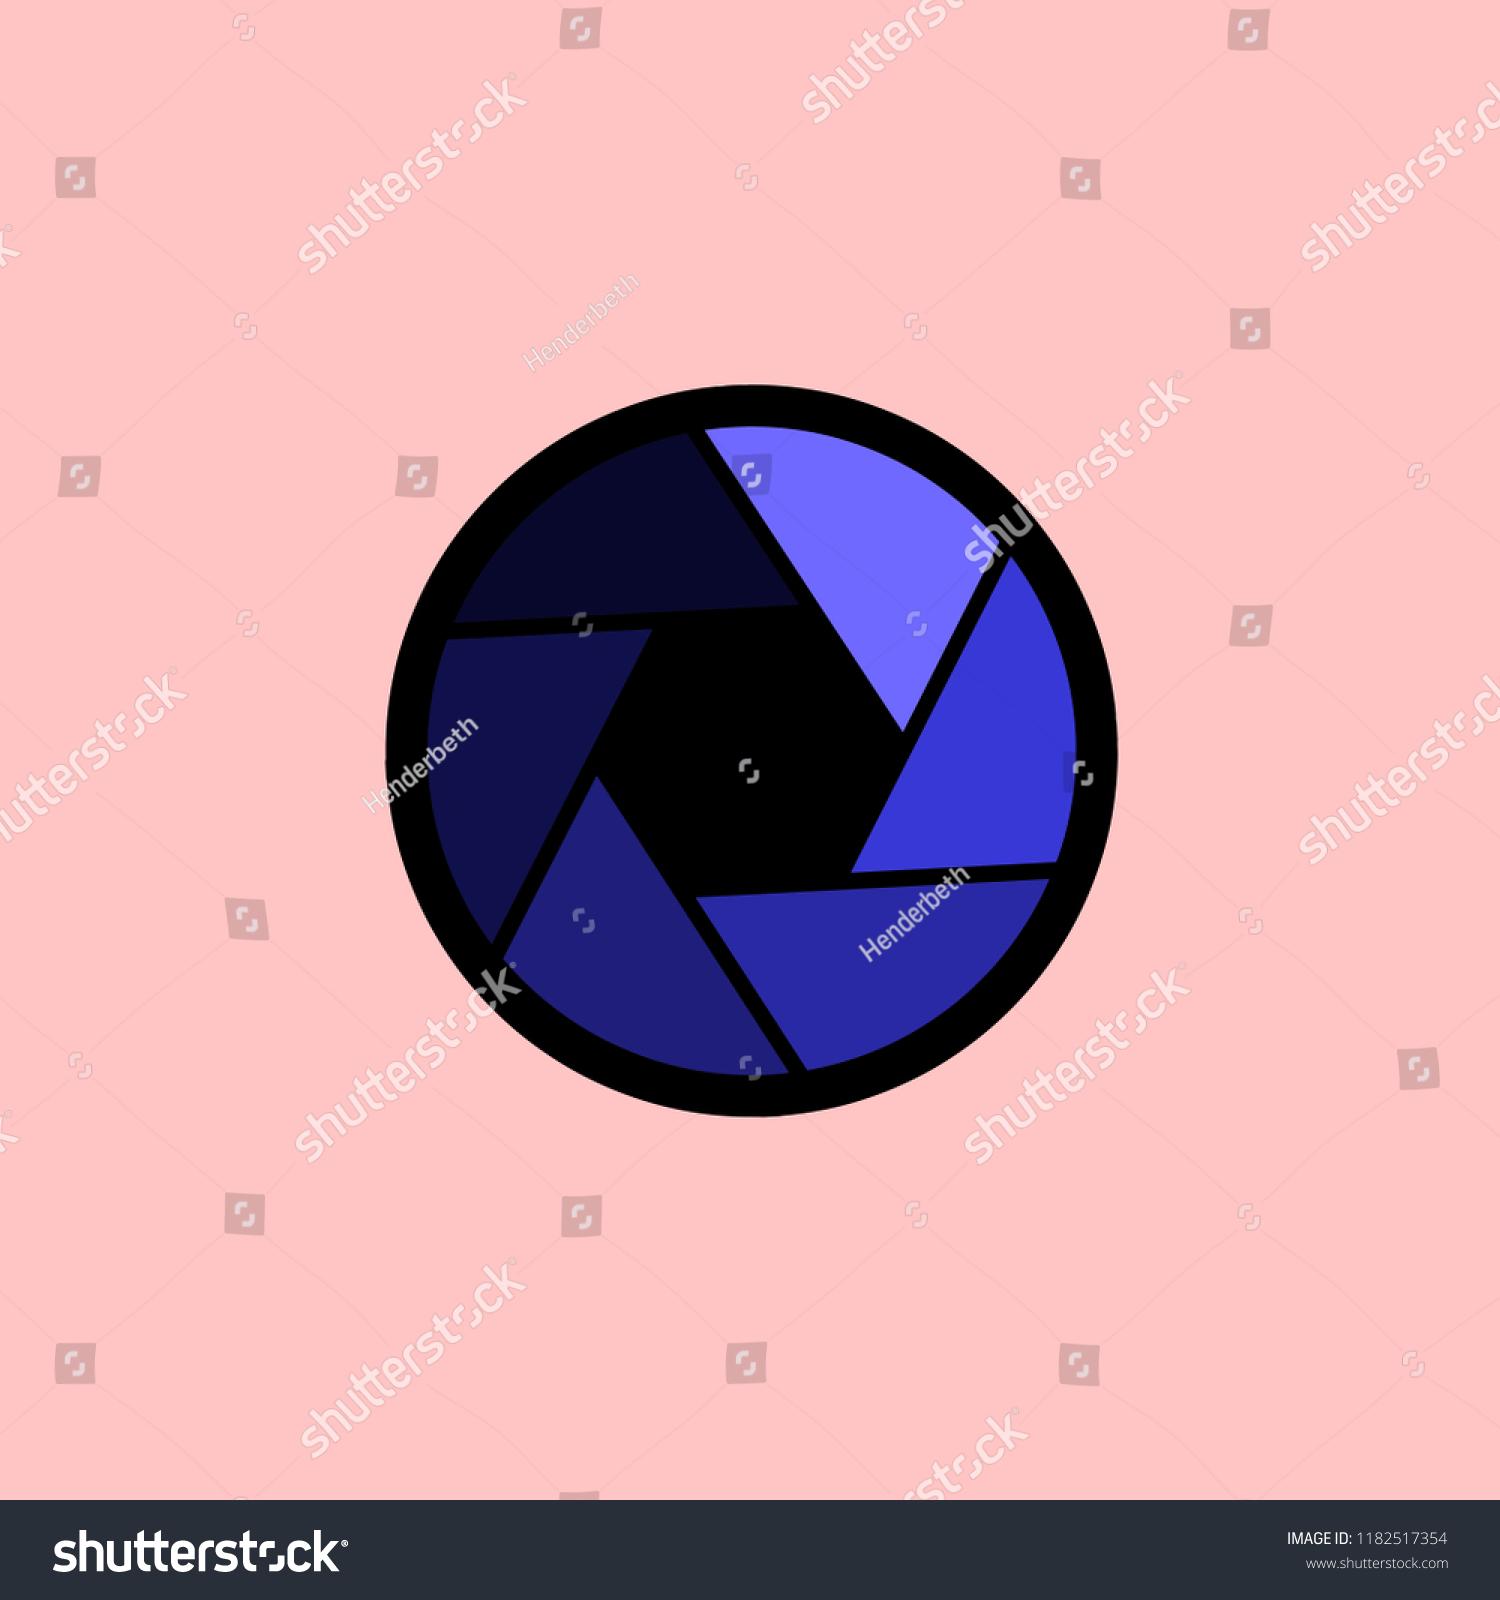 Shutter Icon Flat Style Illustration Vector Stock Vector